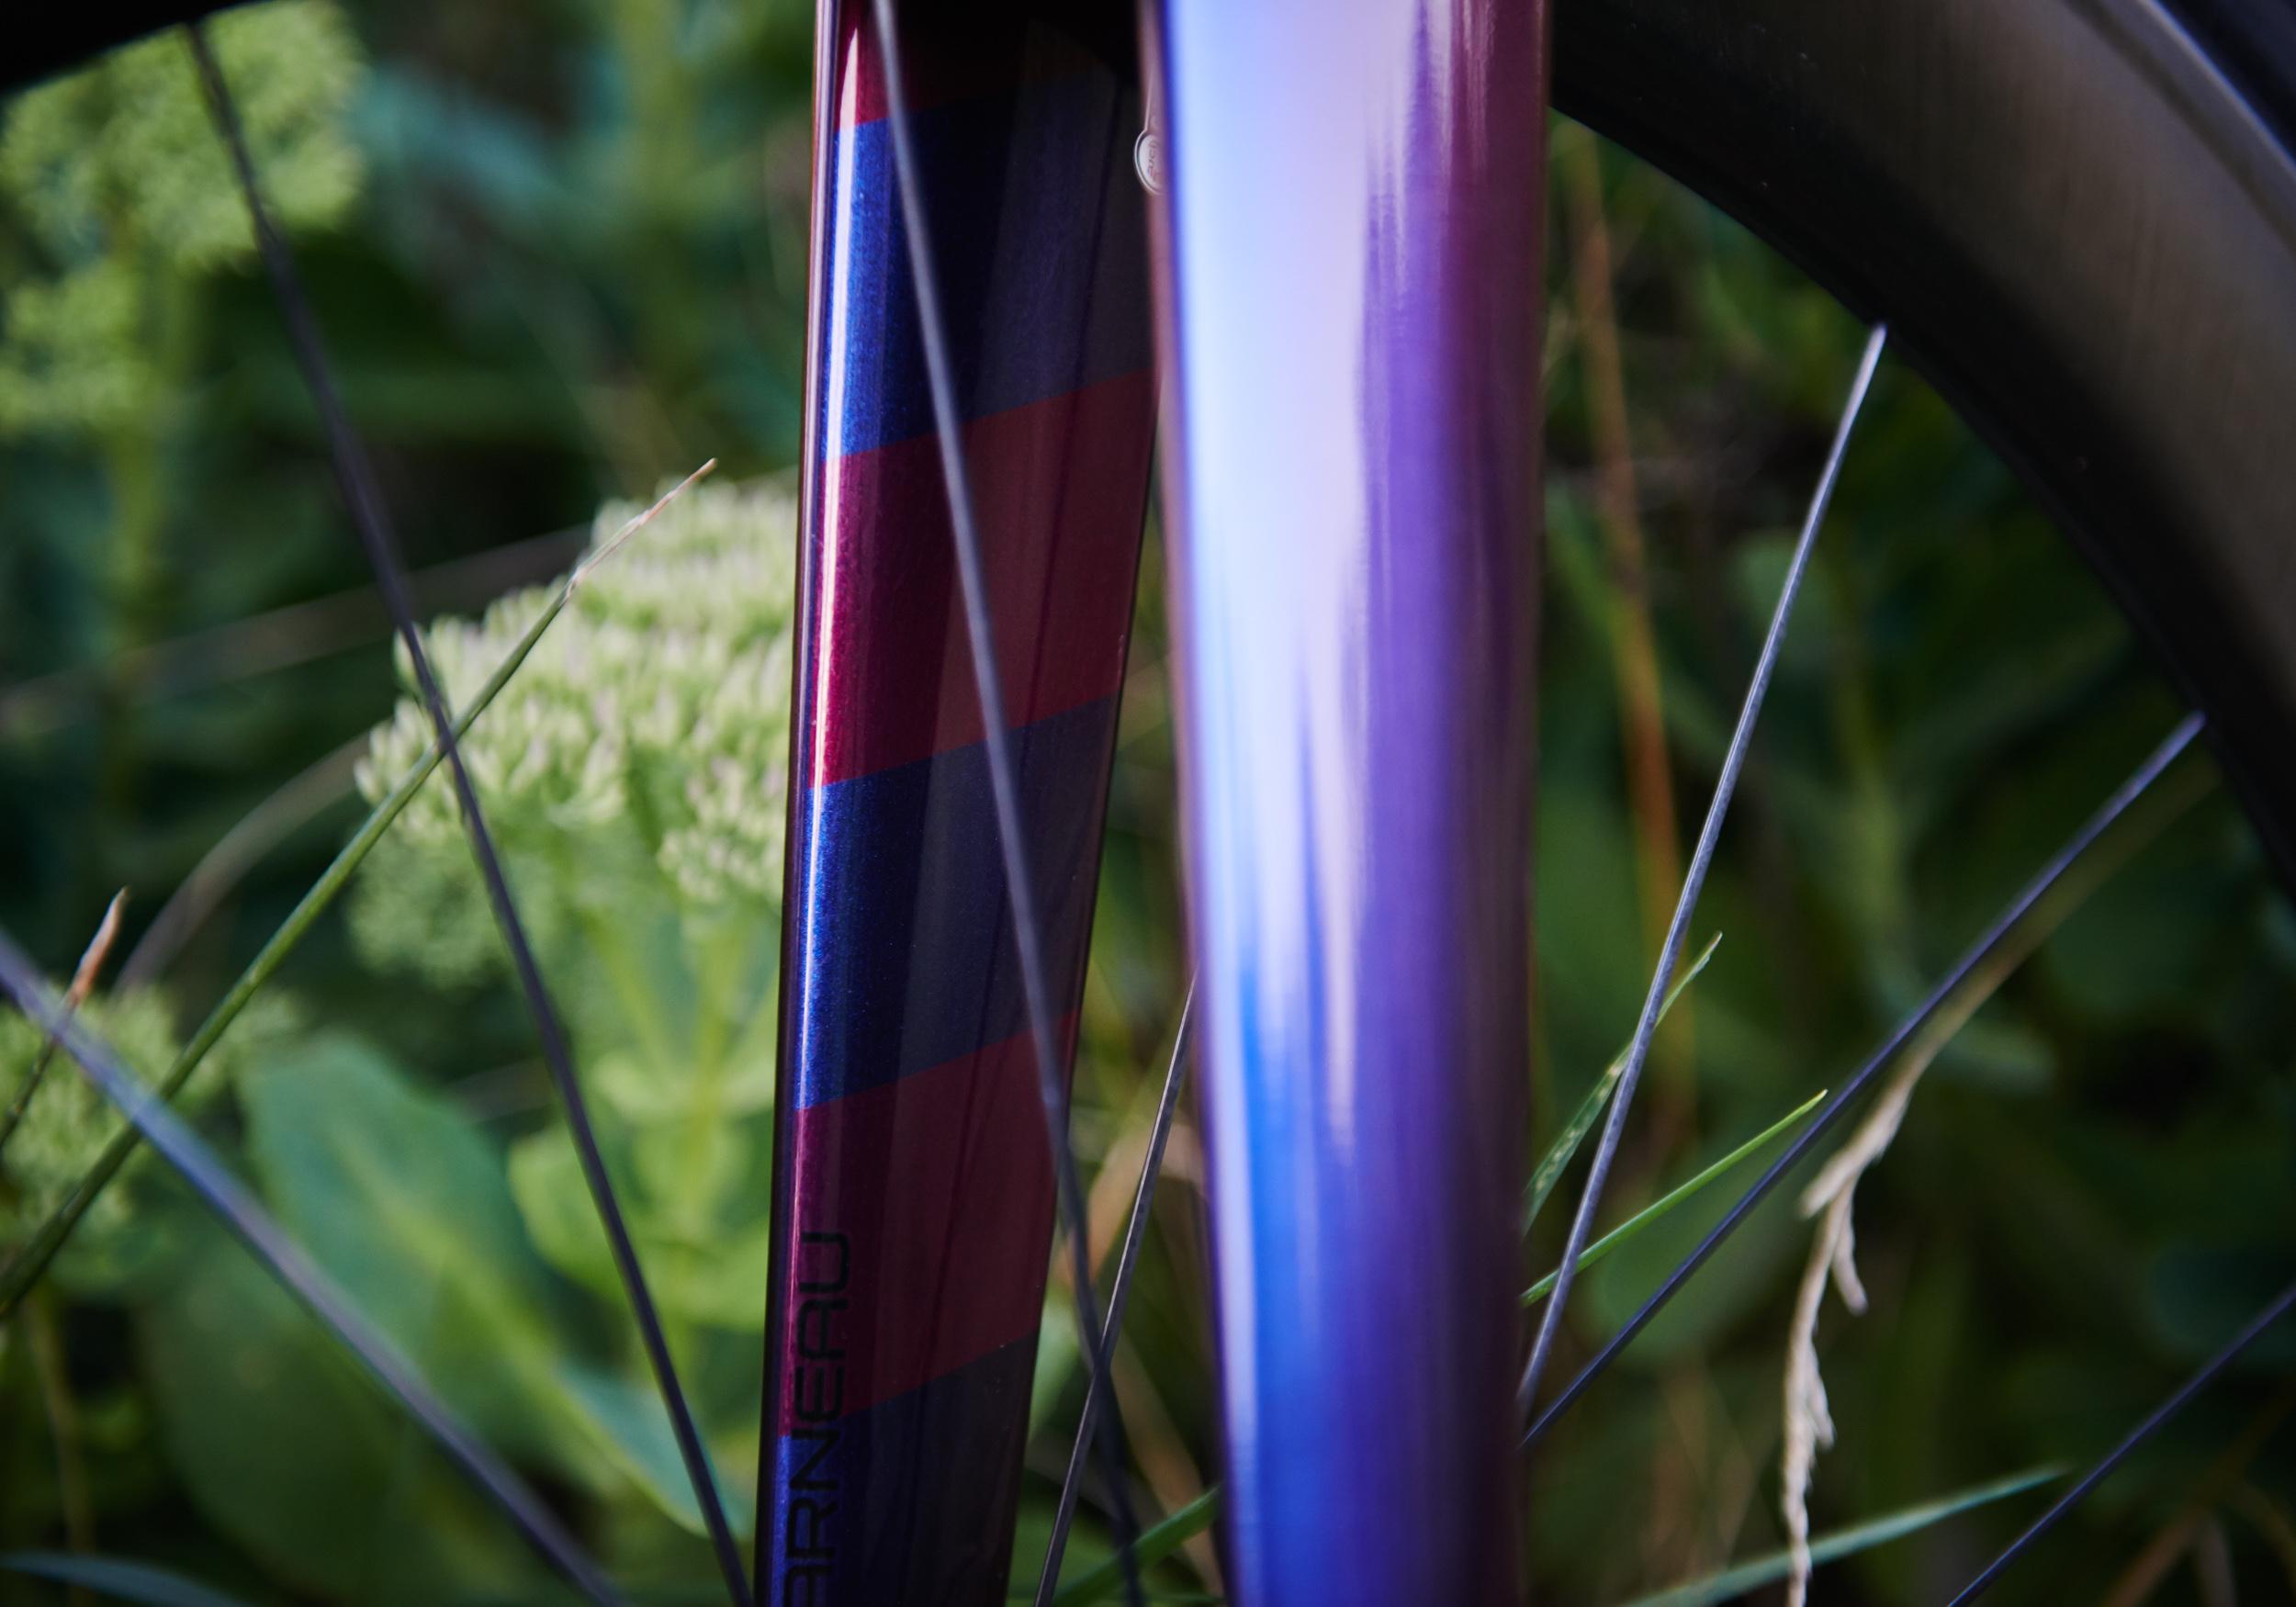 to-be-determined-garneau-a1-bike-review-120.jpg